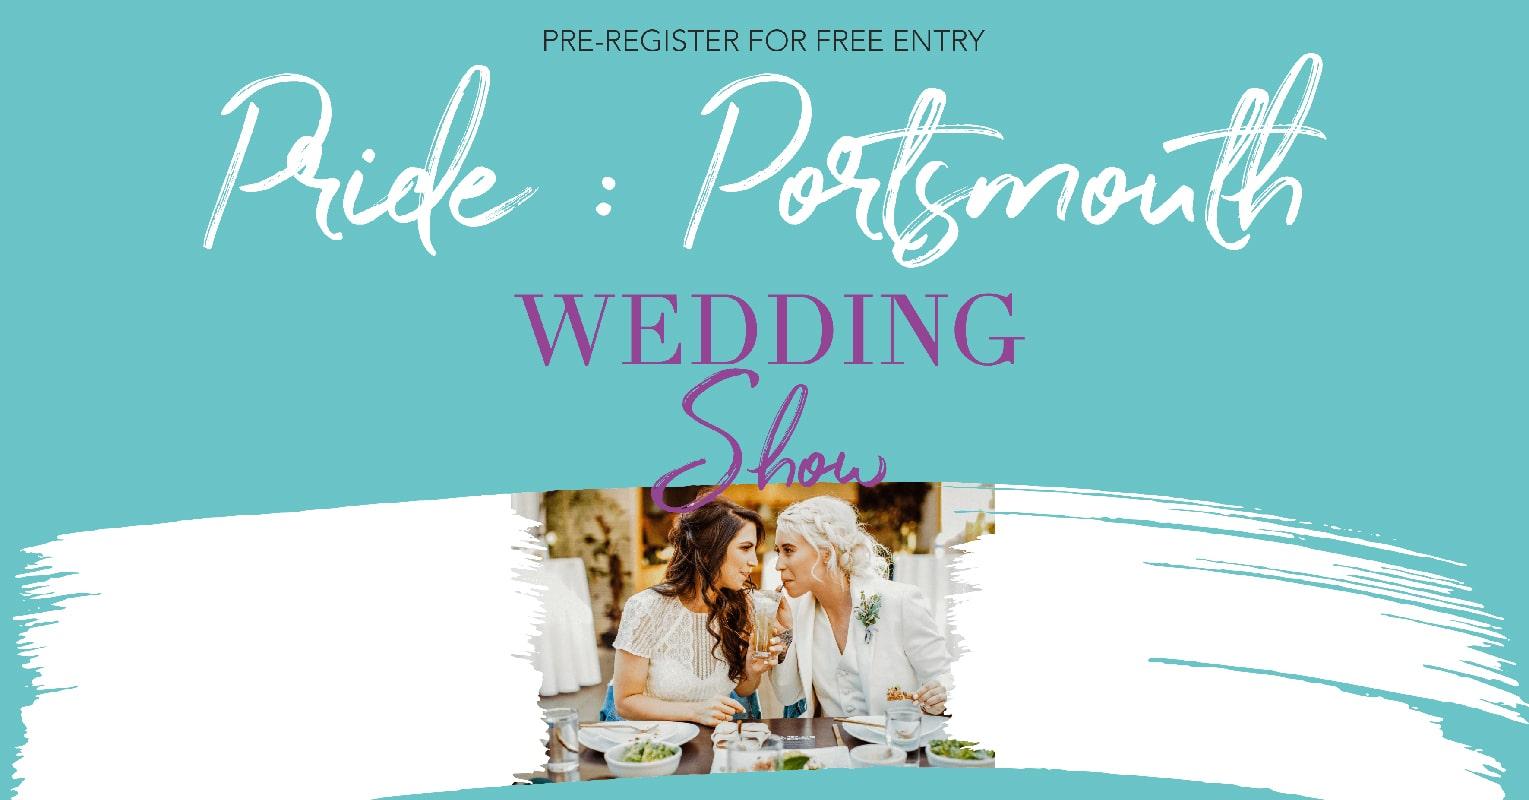 pride dorset portsmouth wedding show banner min 1